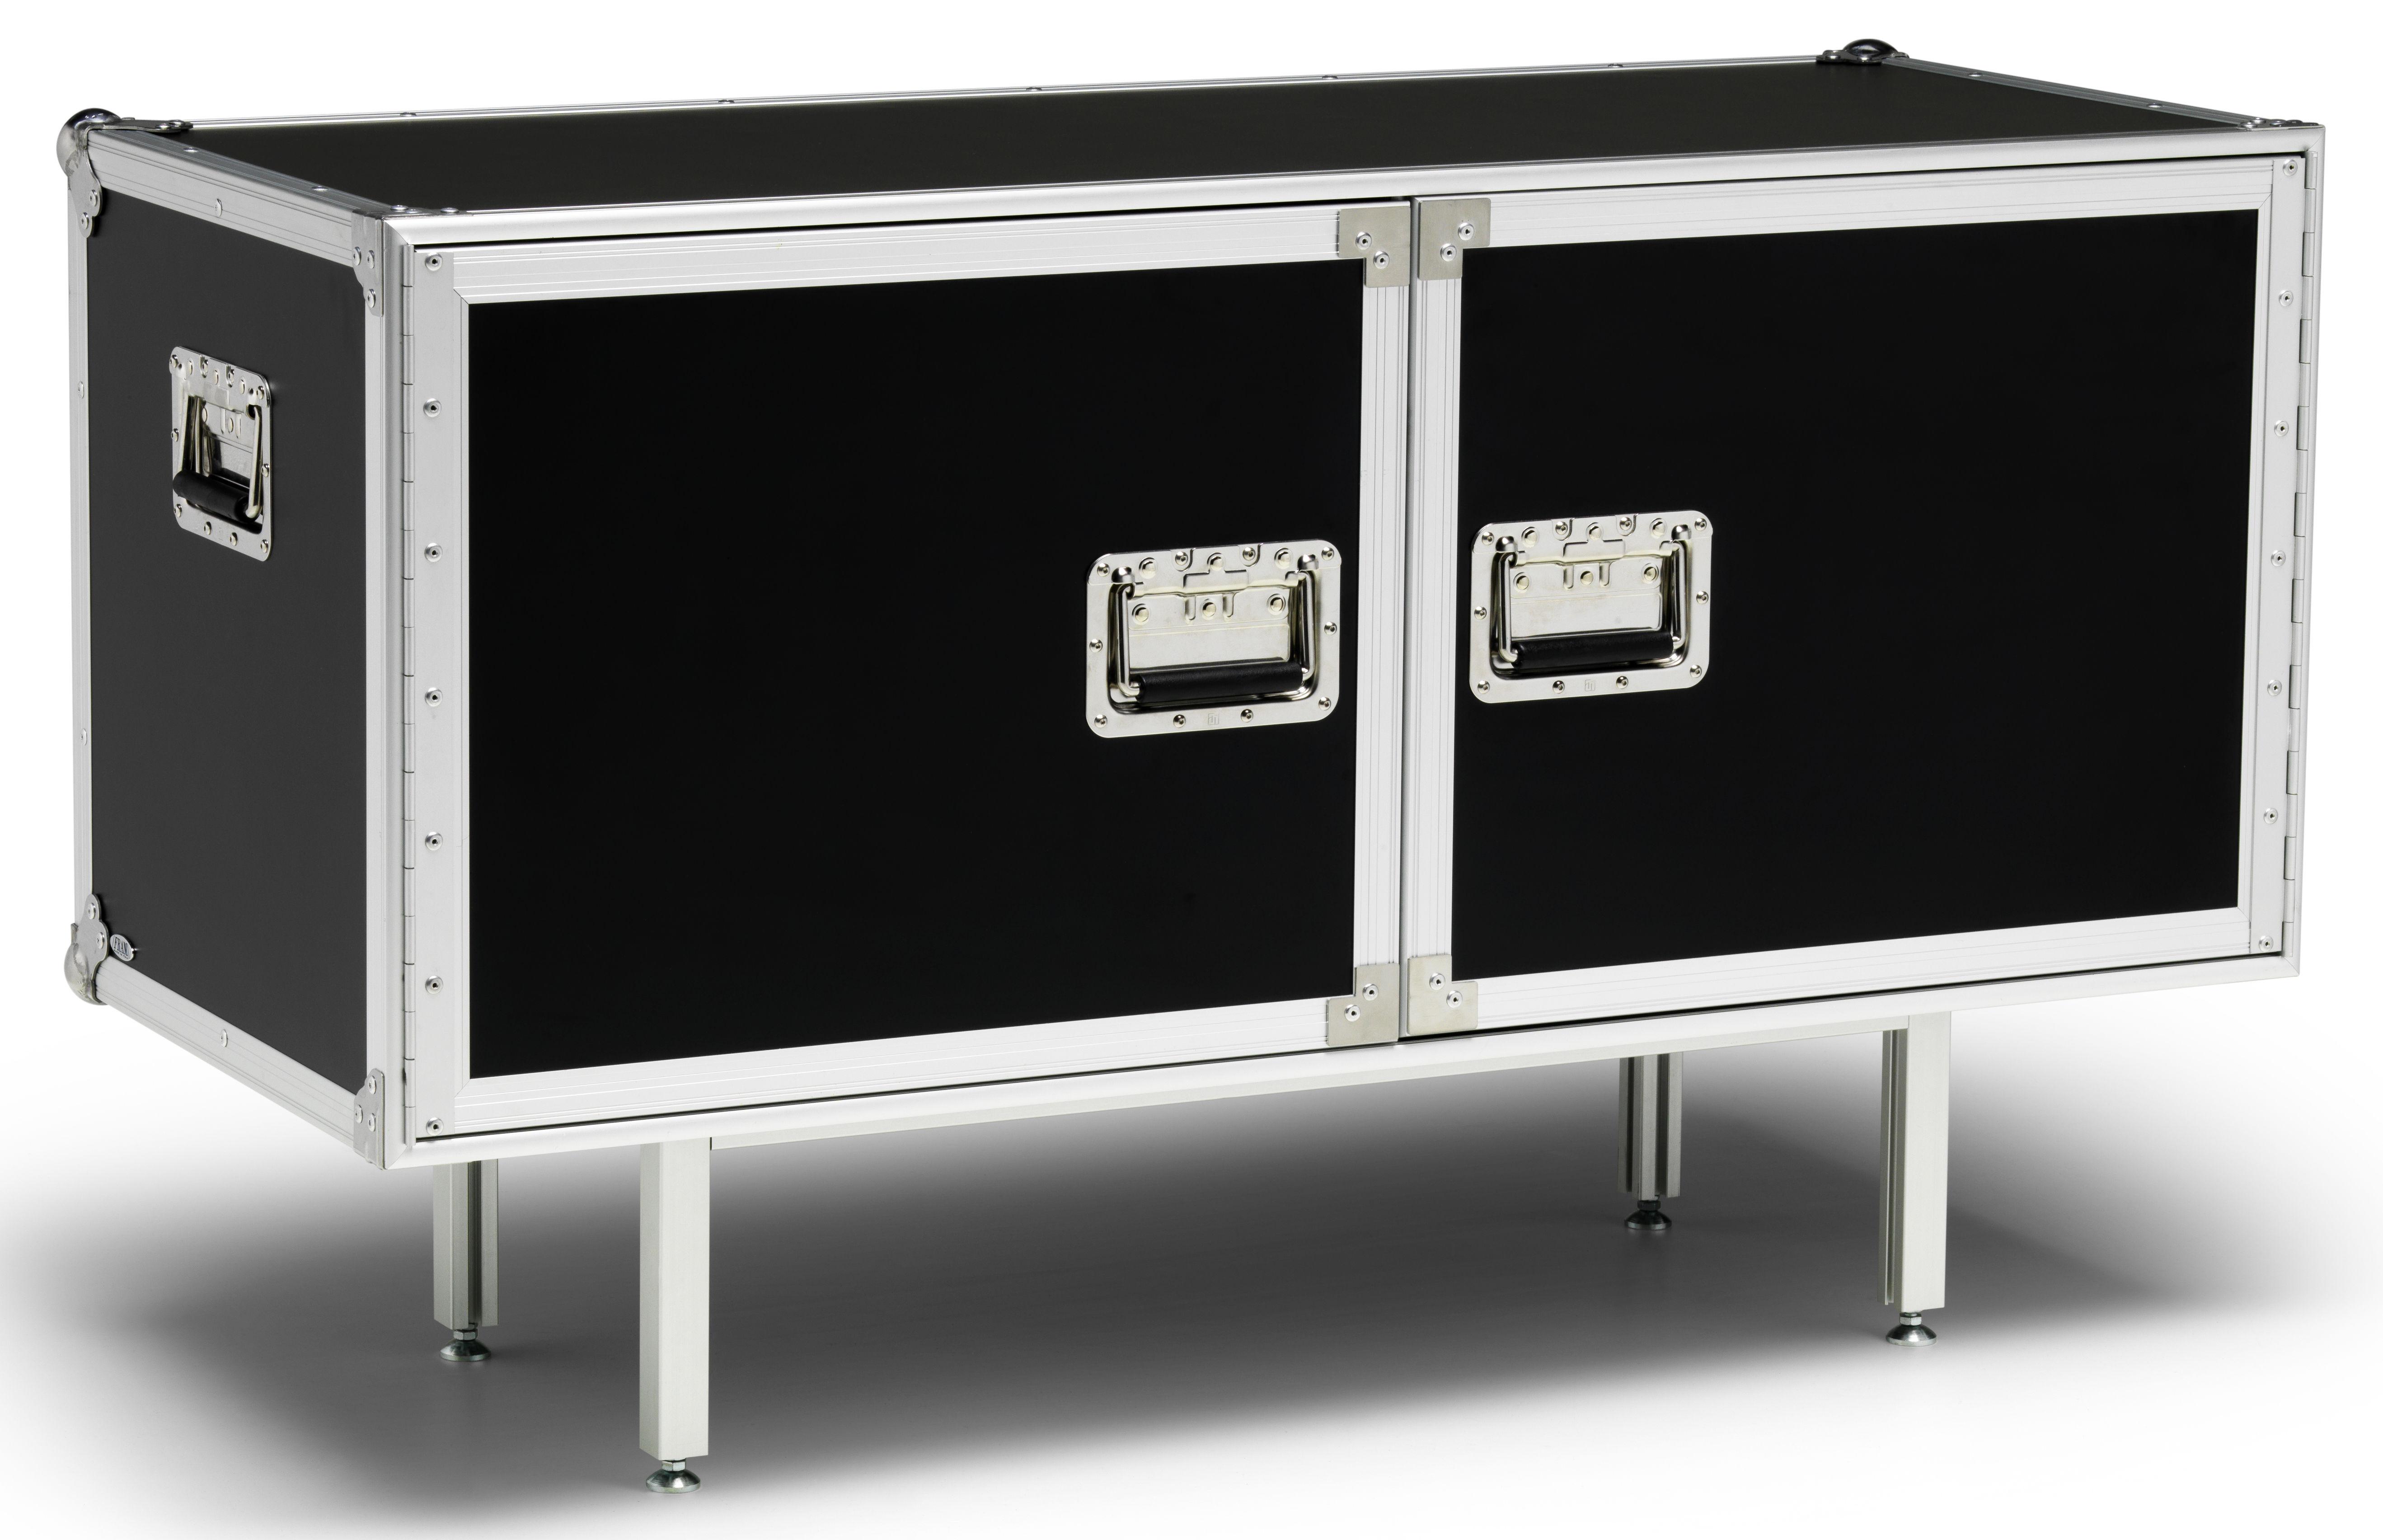 Total Flightcase L 120 cm | Diesel with Moroso | Anrichte